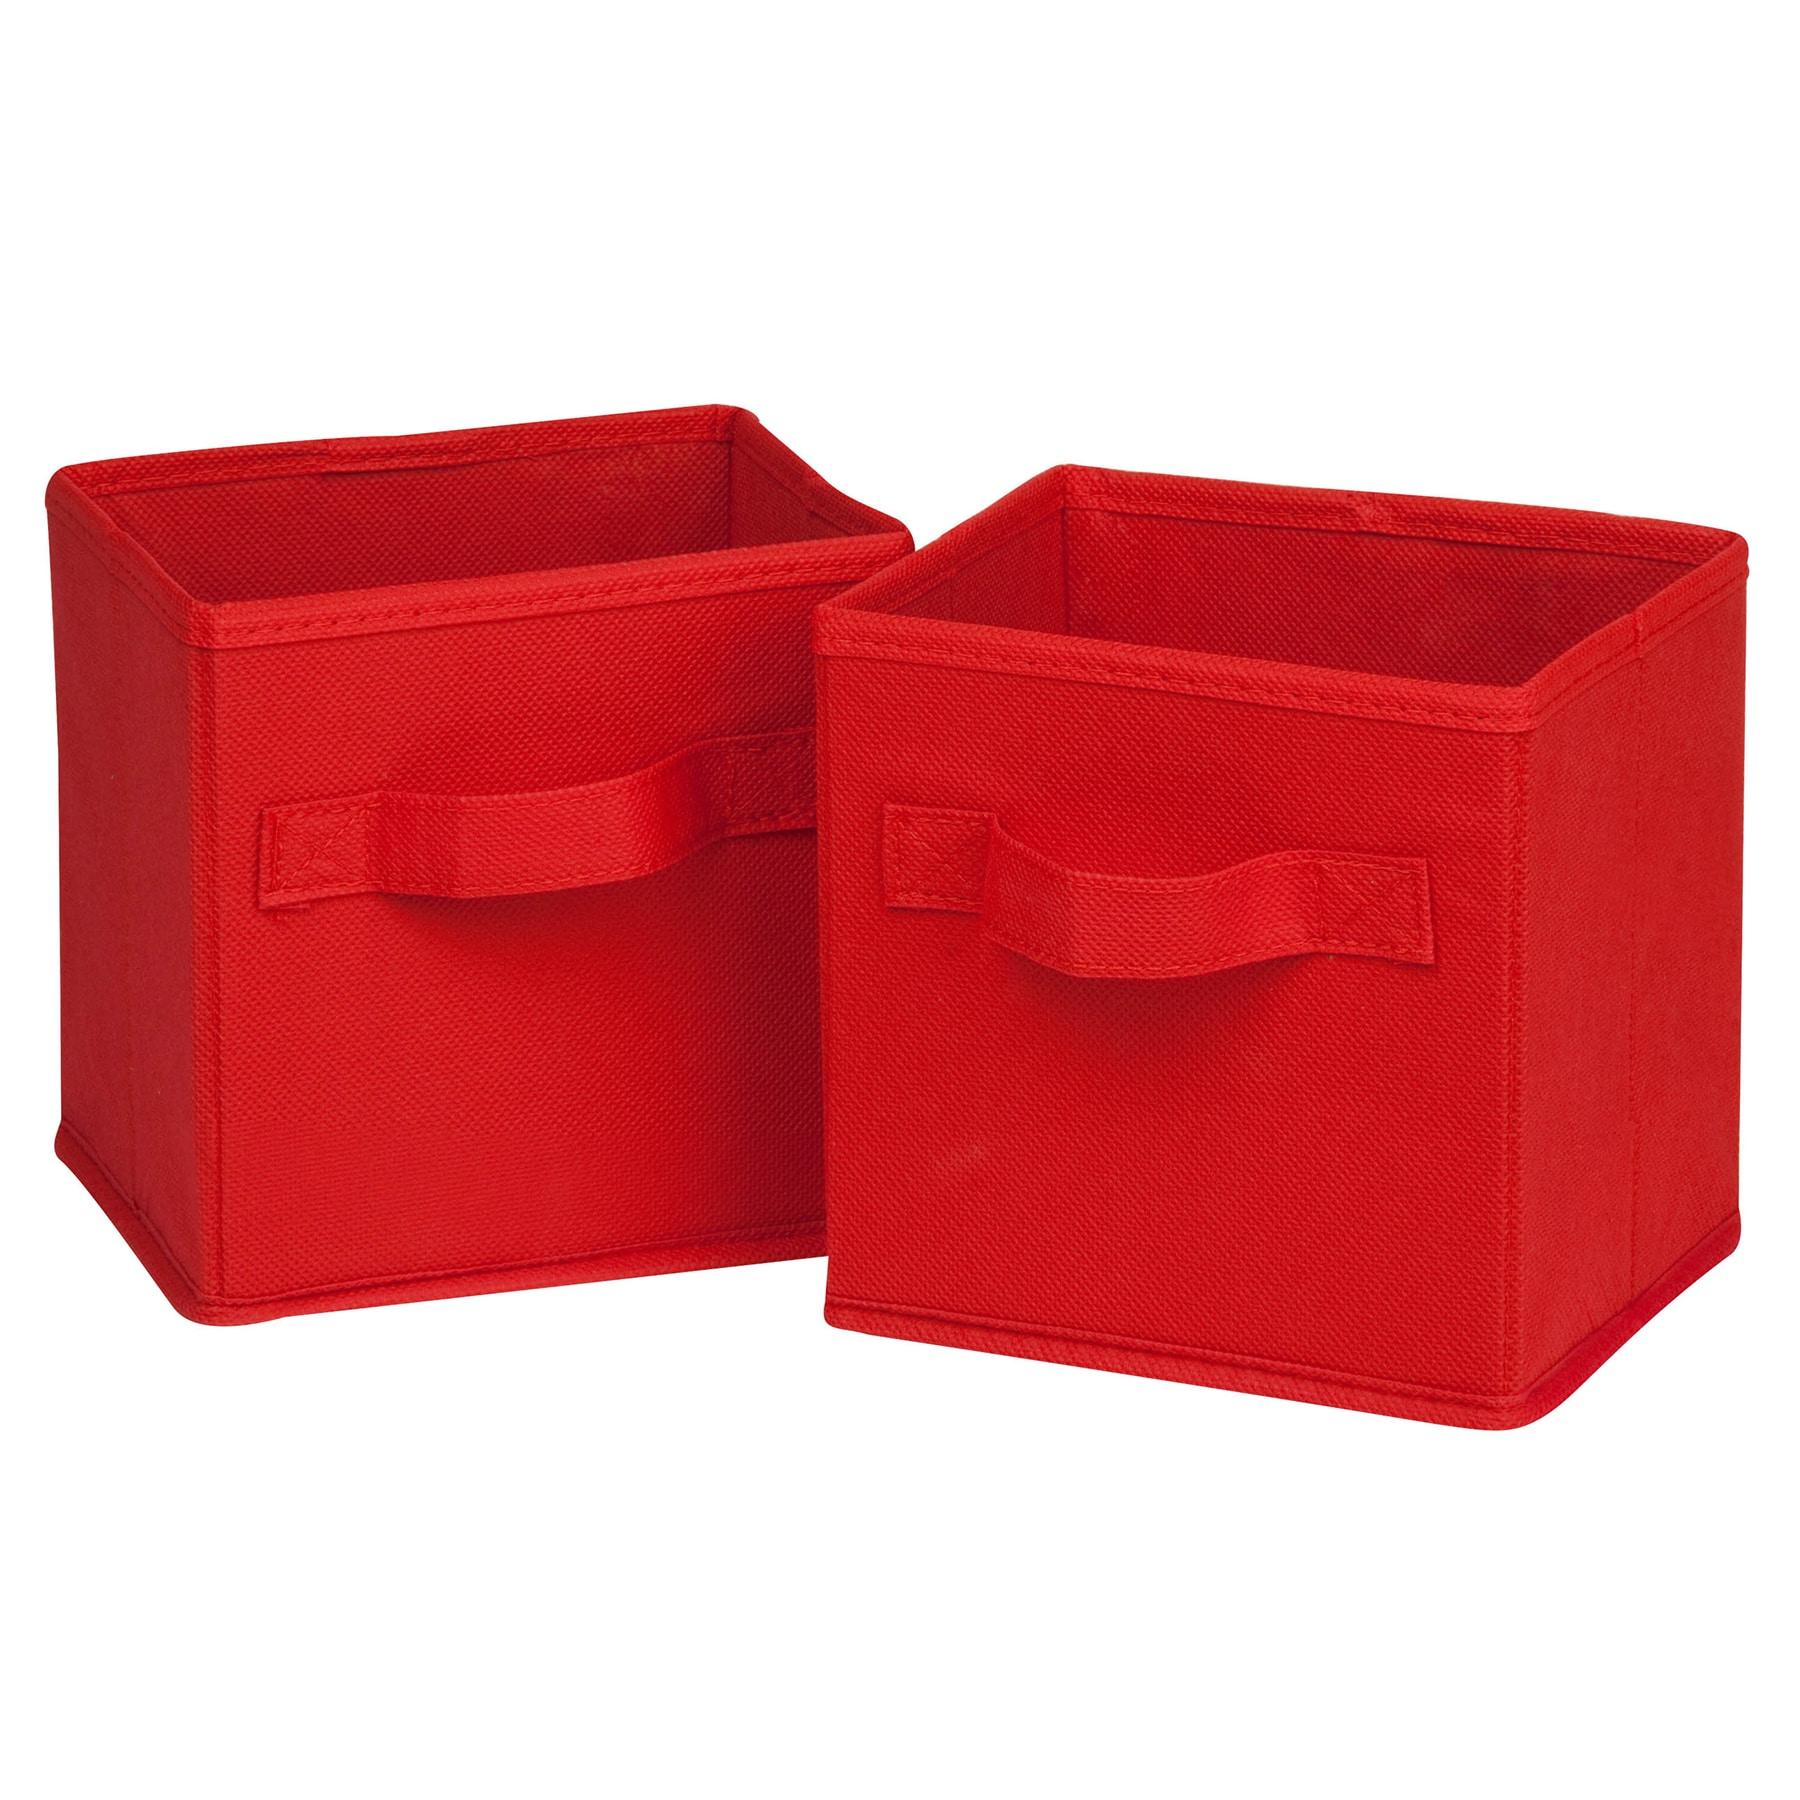 Honey-Can-Do SFT-02089 Mini Red Fabric Storage Bin Pack 2...